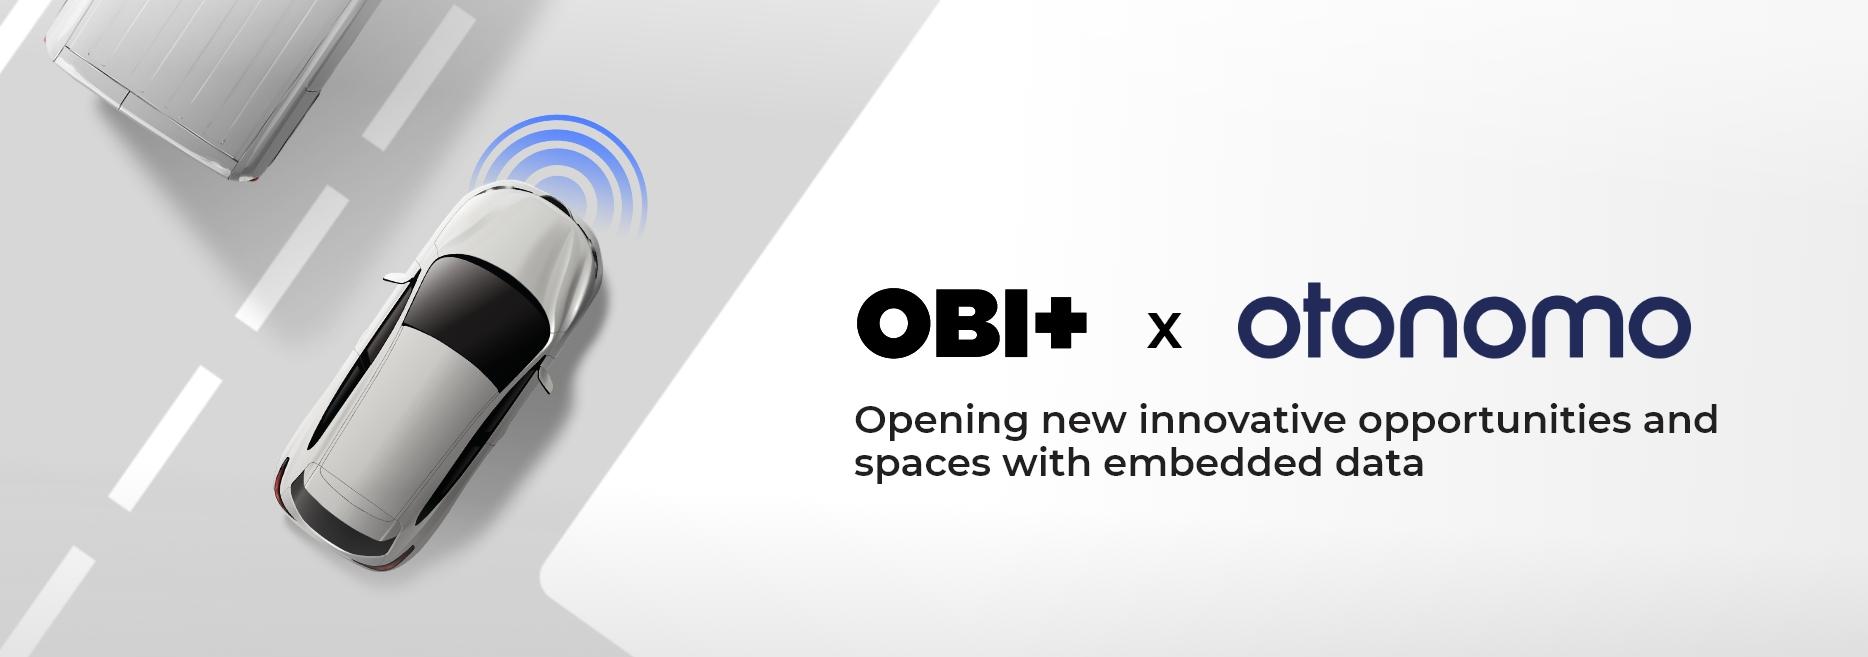 blog-post-The synergy of OBI+ and Otonomo